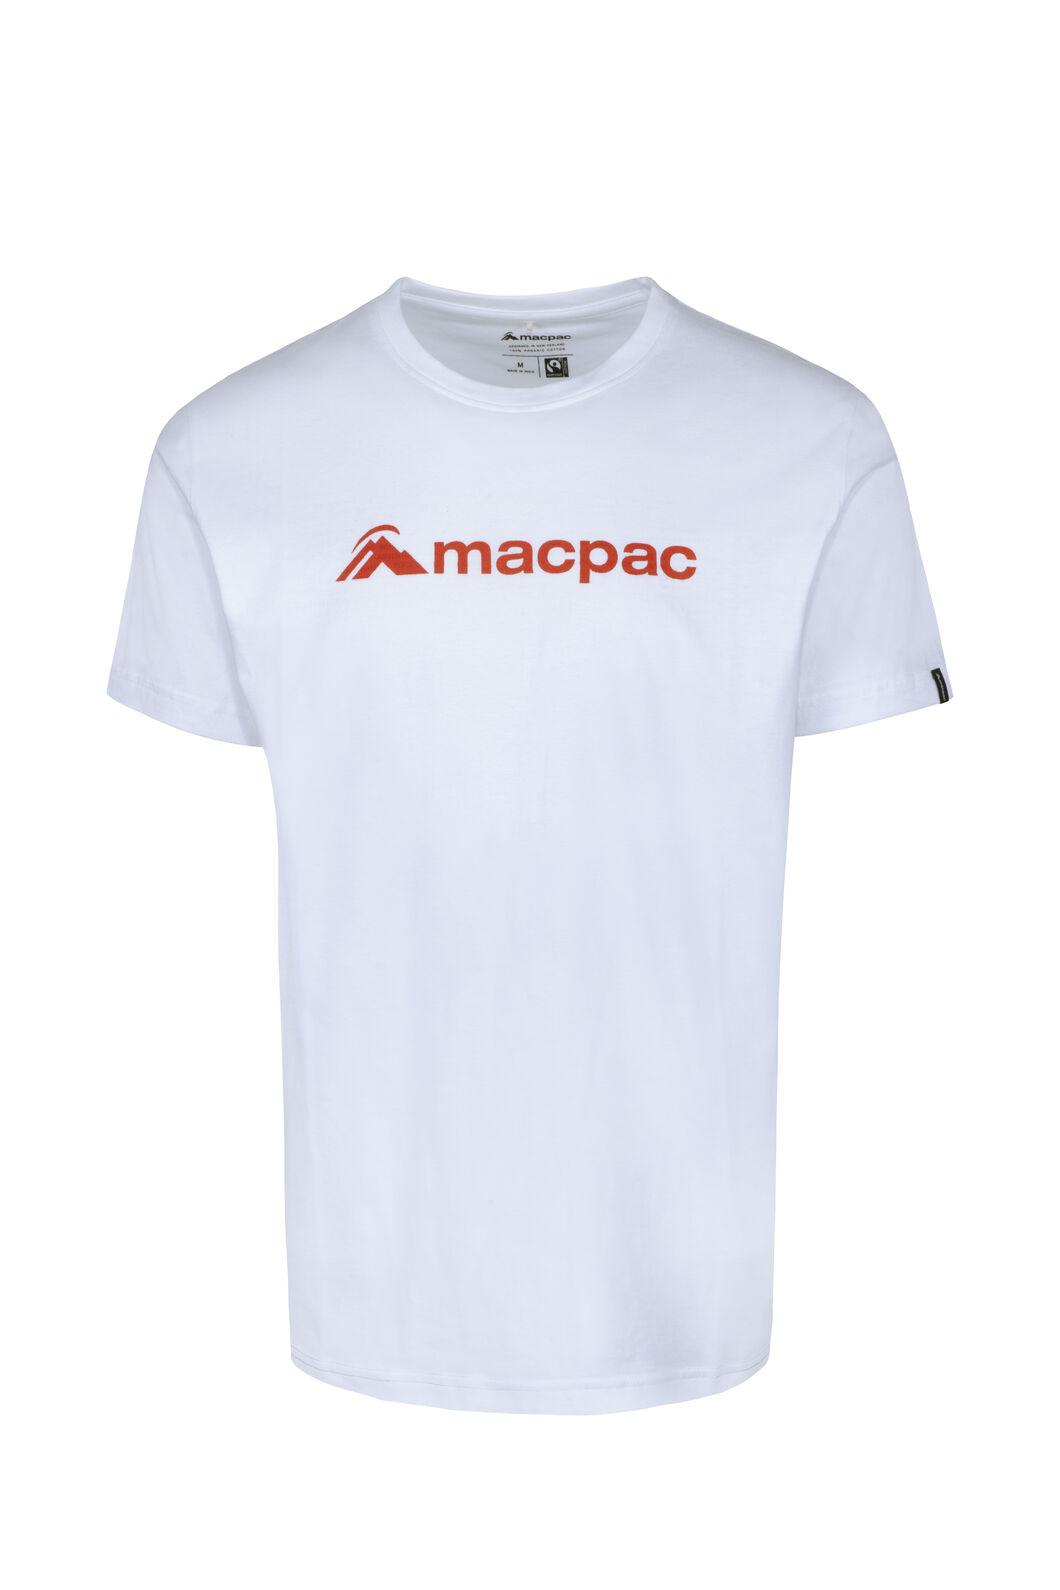 Macpac Logo Fairtrade Organic Cotton Tee — Men's, White, hi-res